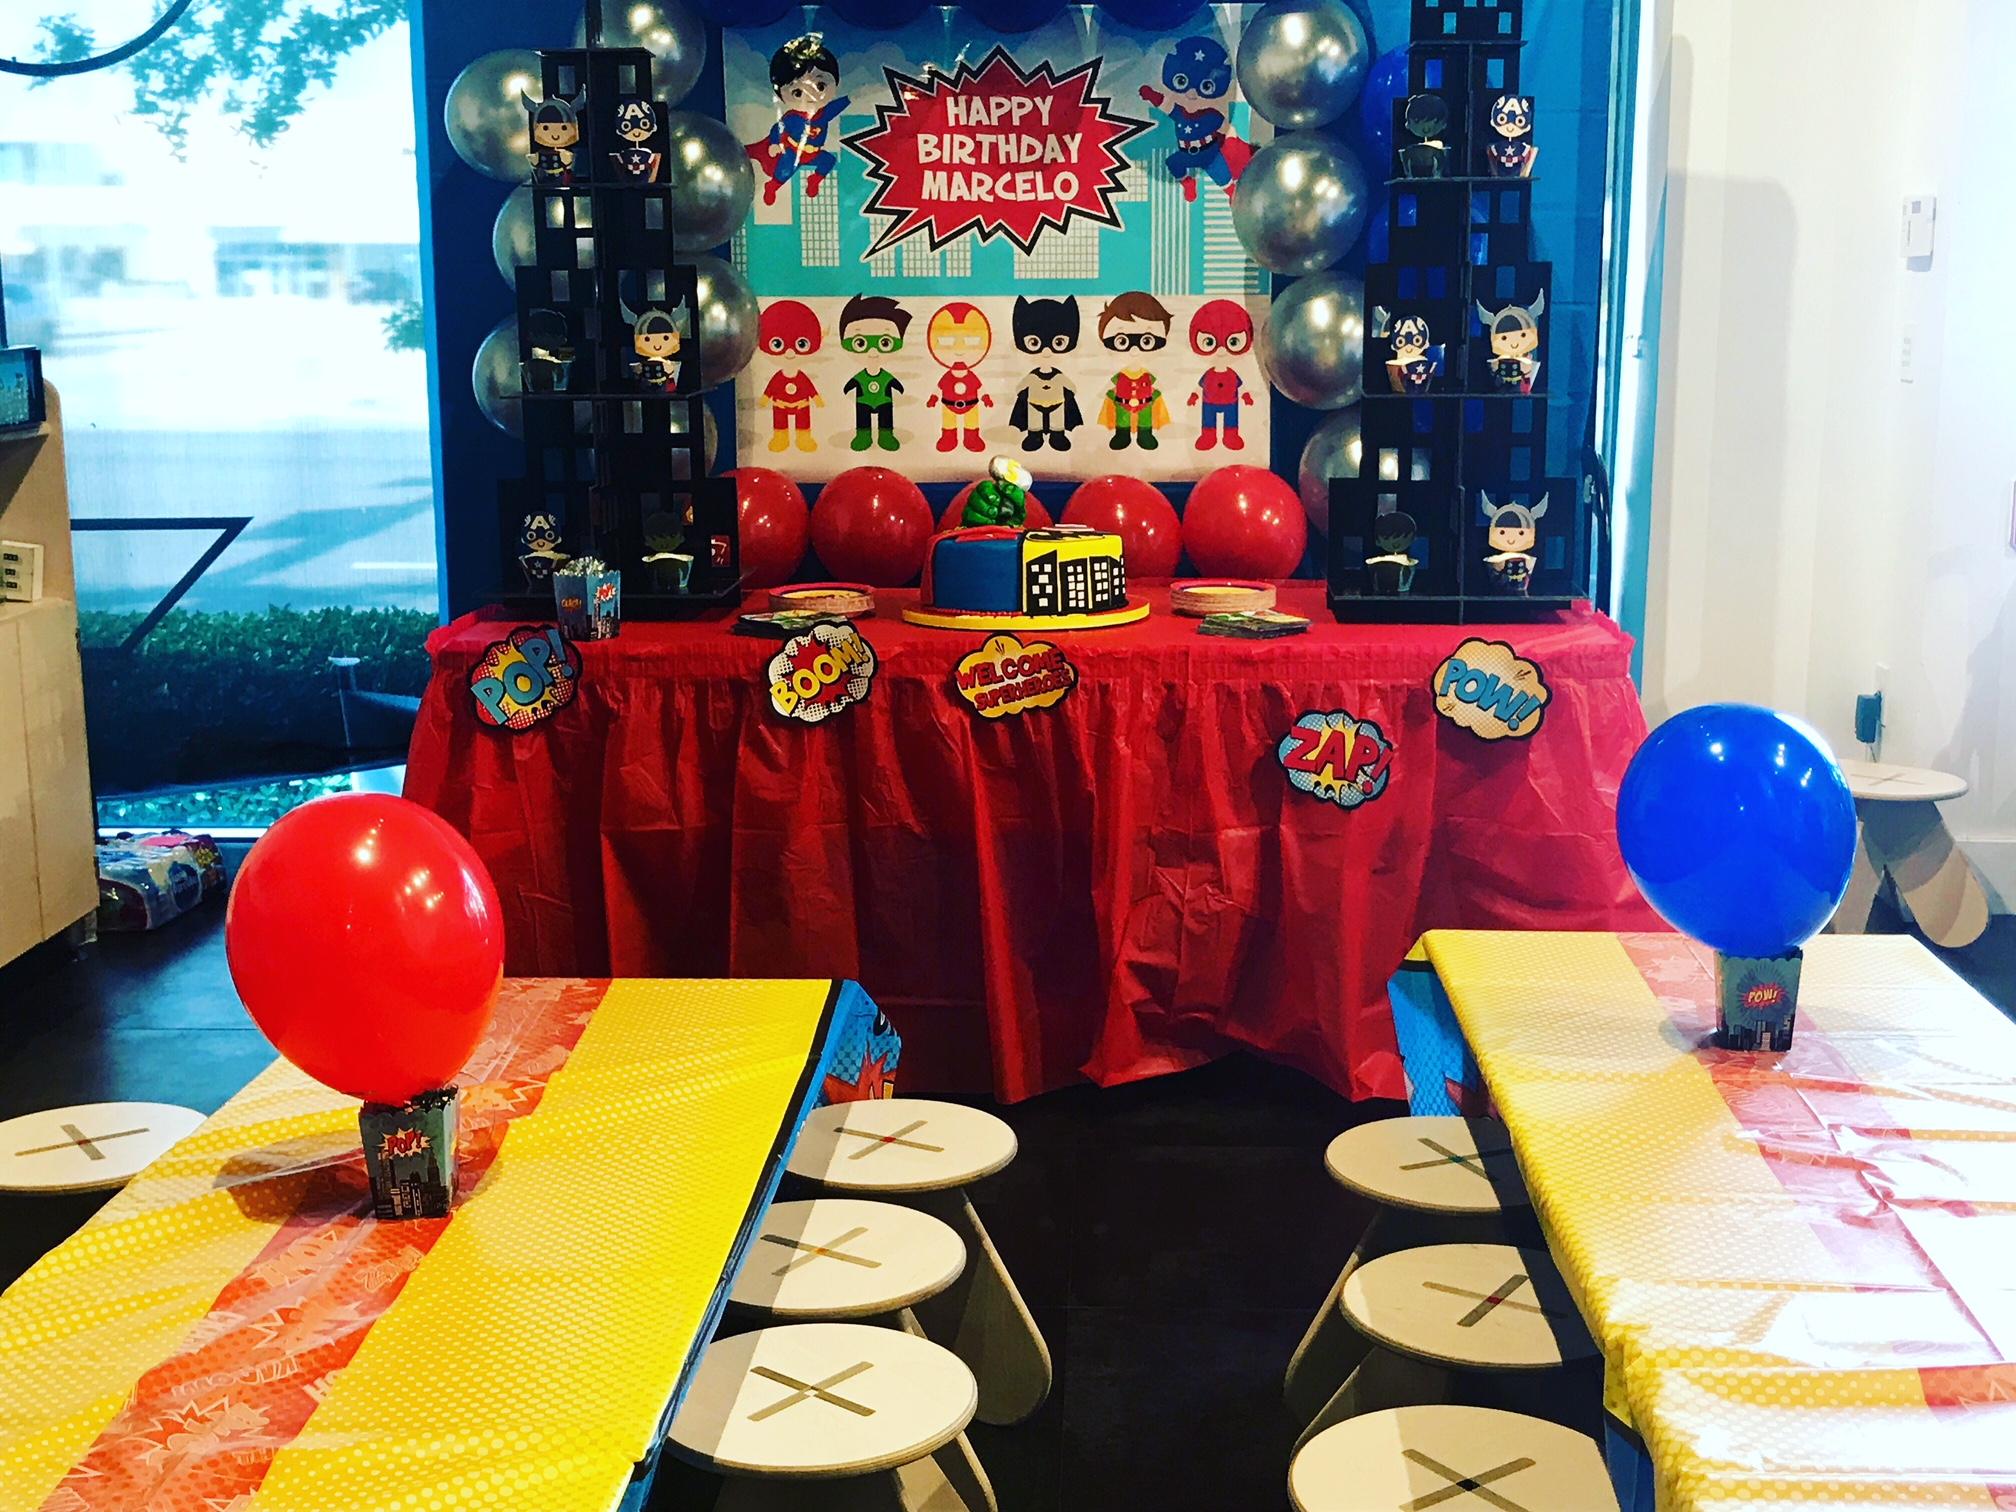 POD 22 Party